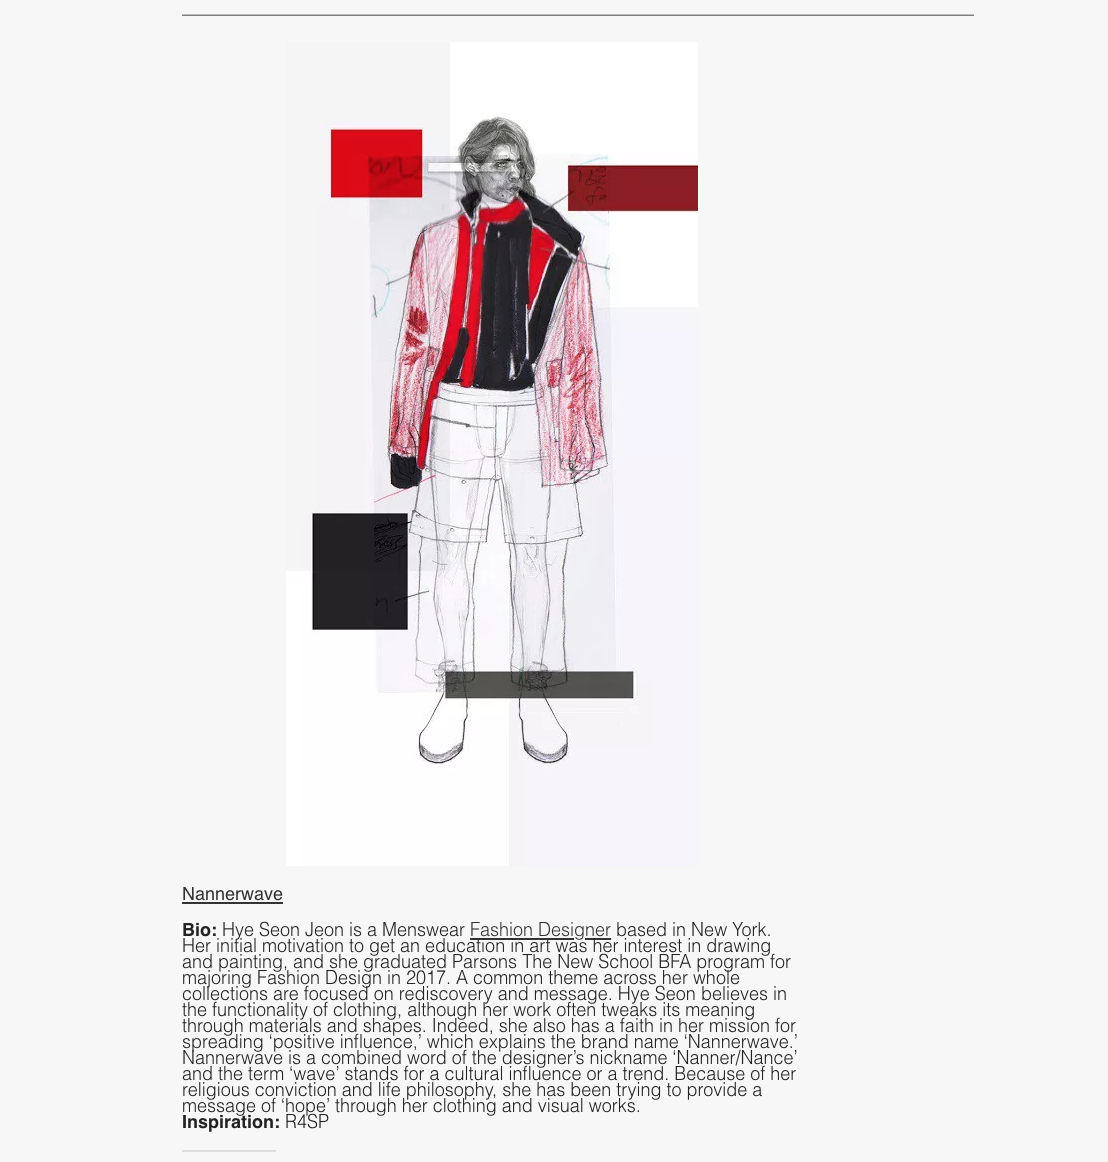 true fashionista now - http://truefashionistanow.com/2018/01/30/new-designers-at-new-york-fashion-week-oxford-fashion-studio-new-york-fw18/